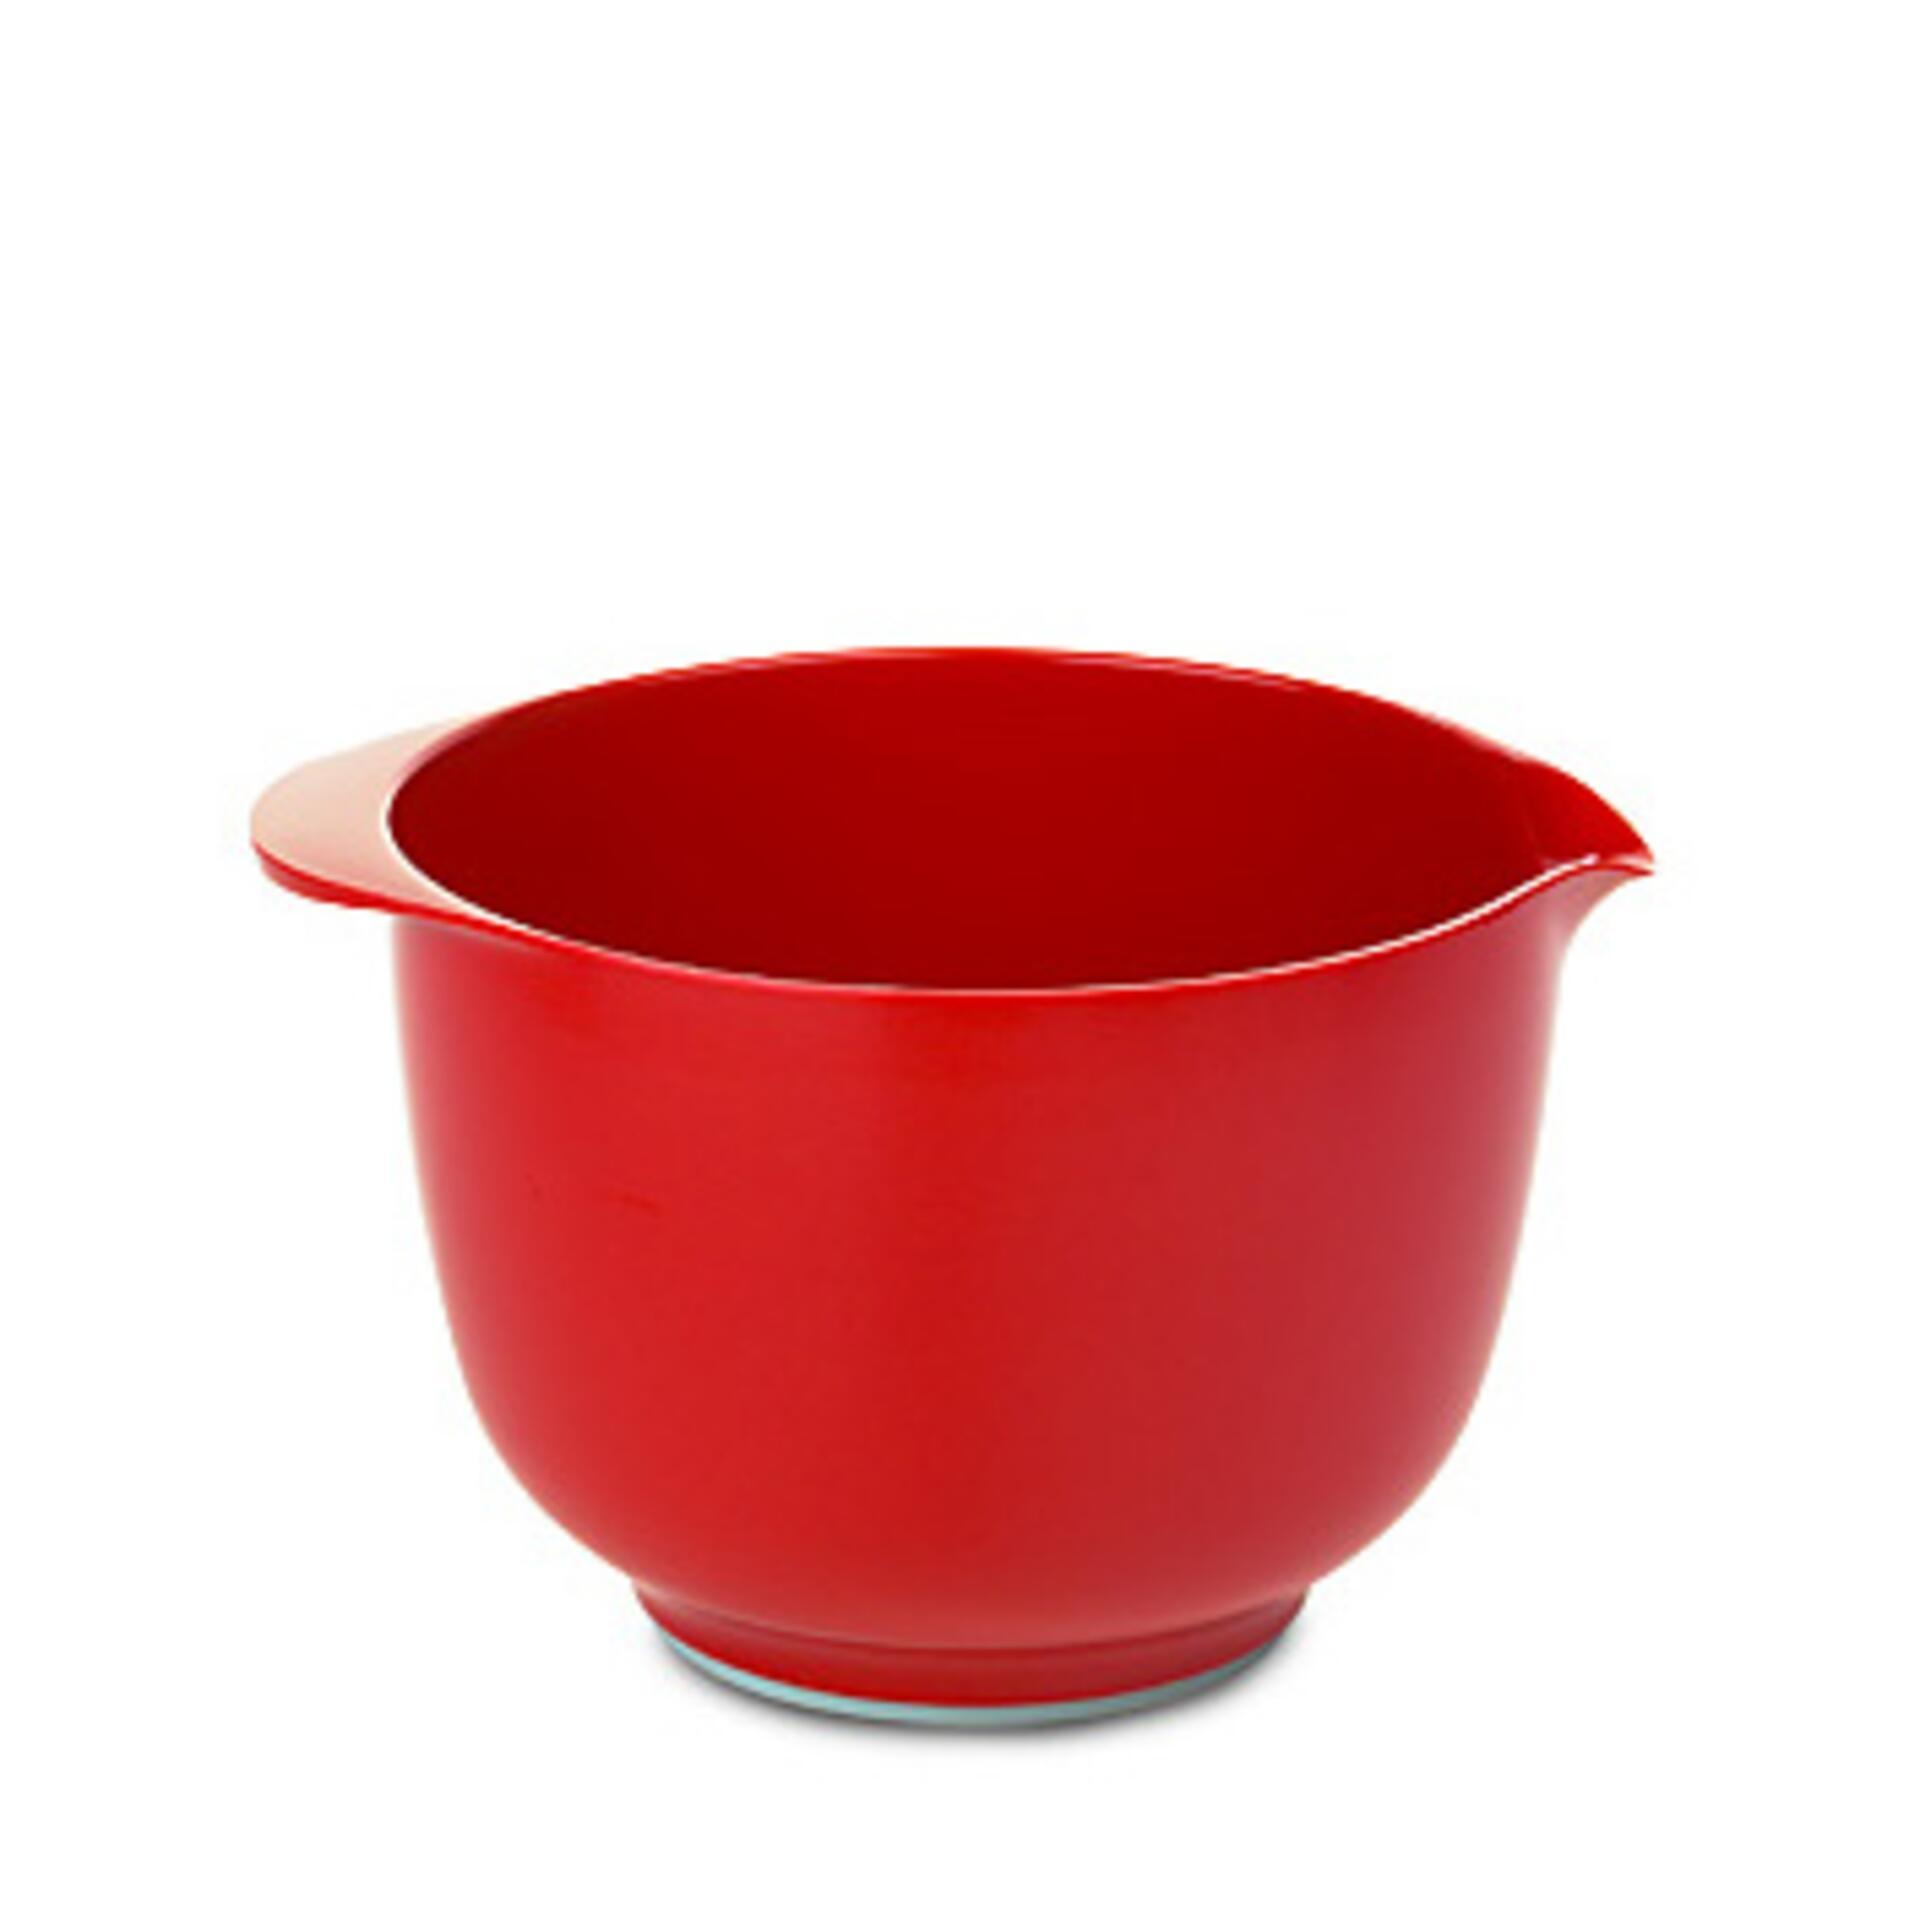 Rosti Mepal Margrethe Rührschüssel 2,0 l Rot